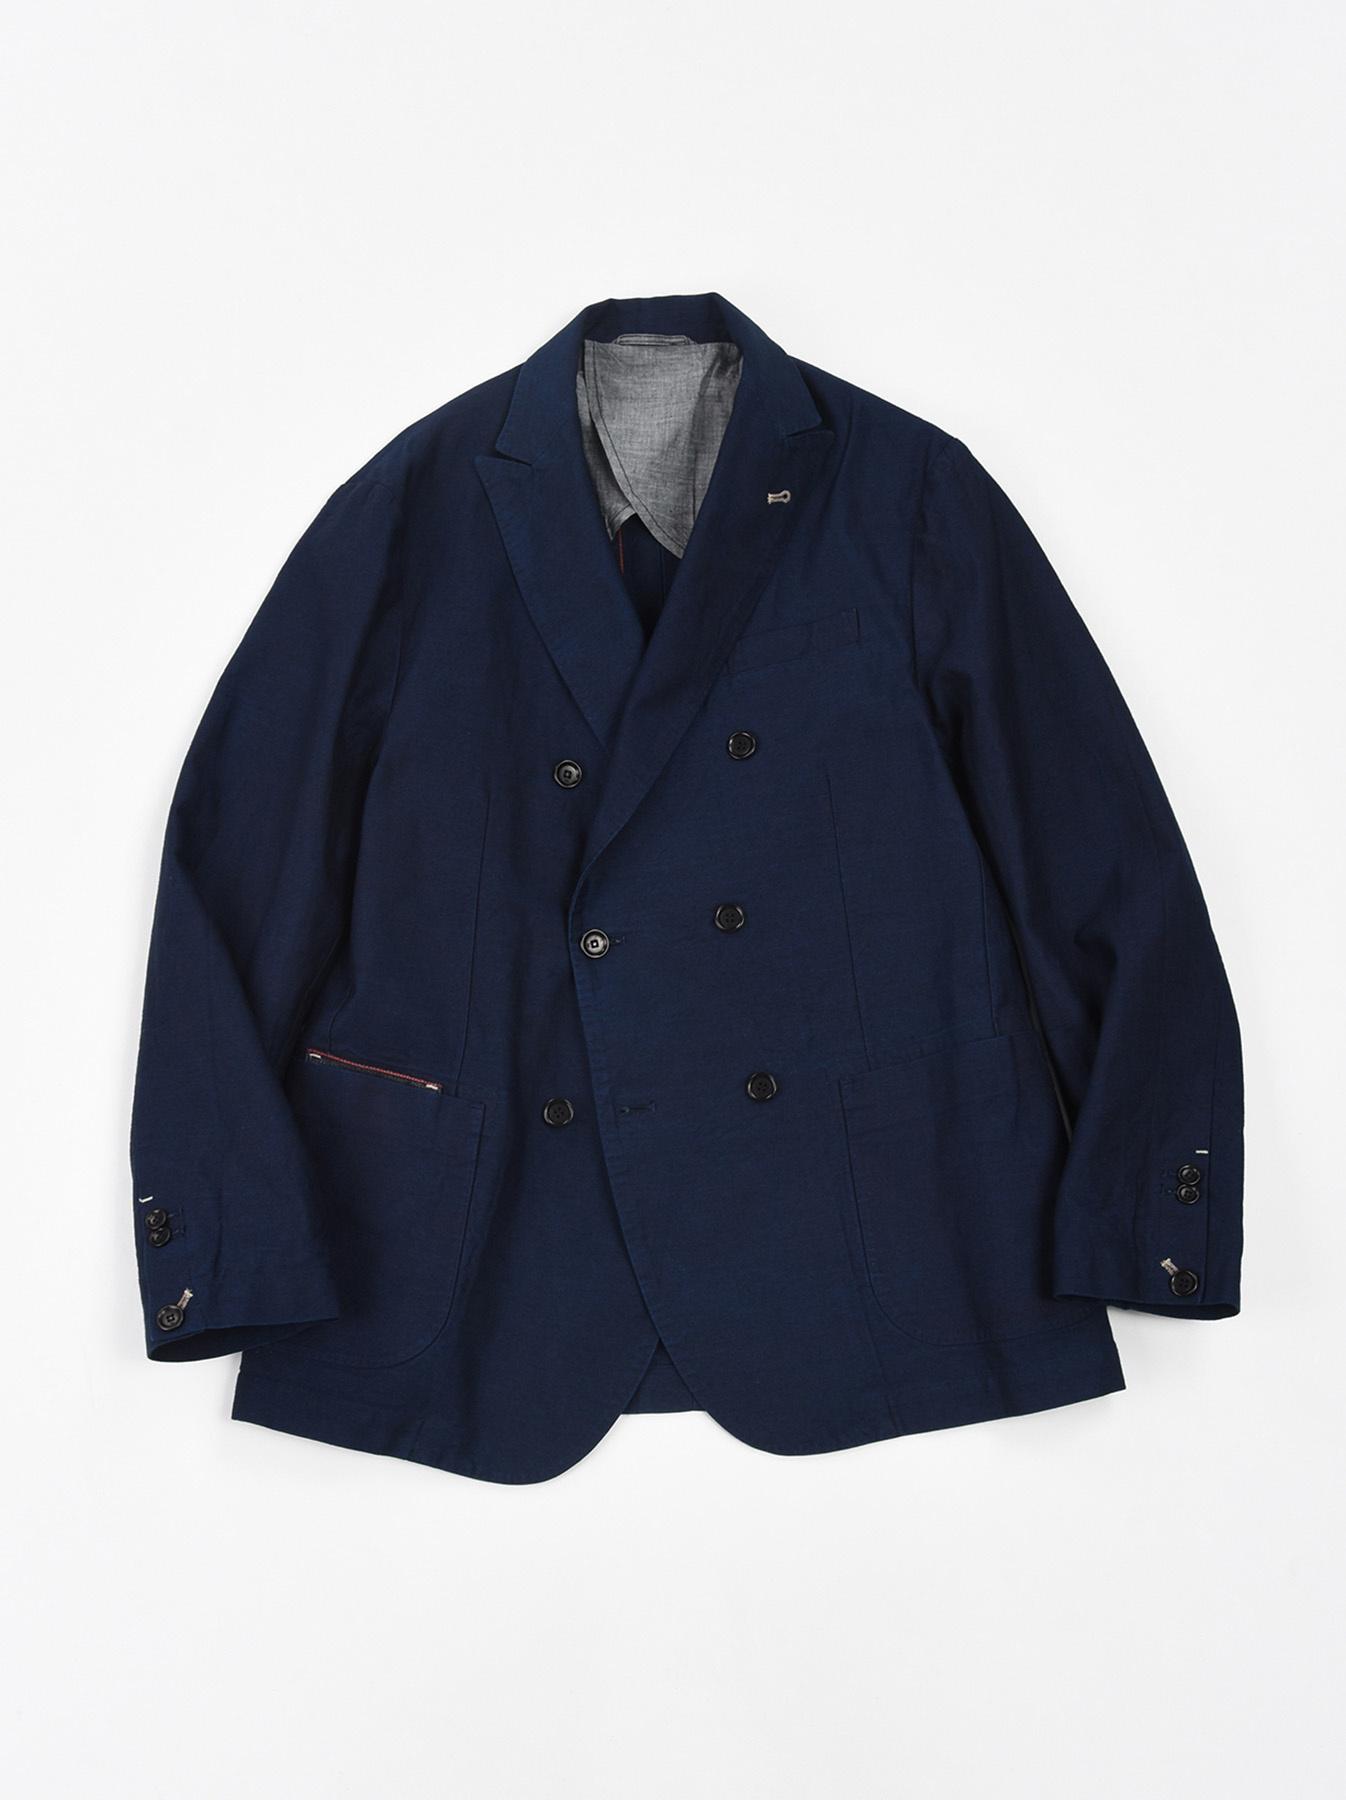 Indigo Mugi Yoko-shusi Soroe Double Breasted Jacket-1